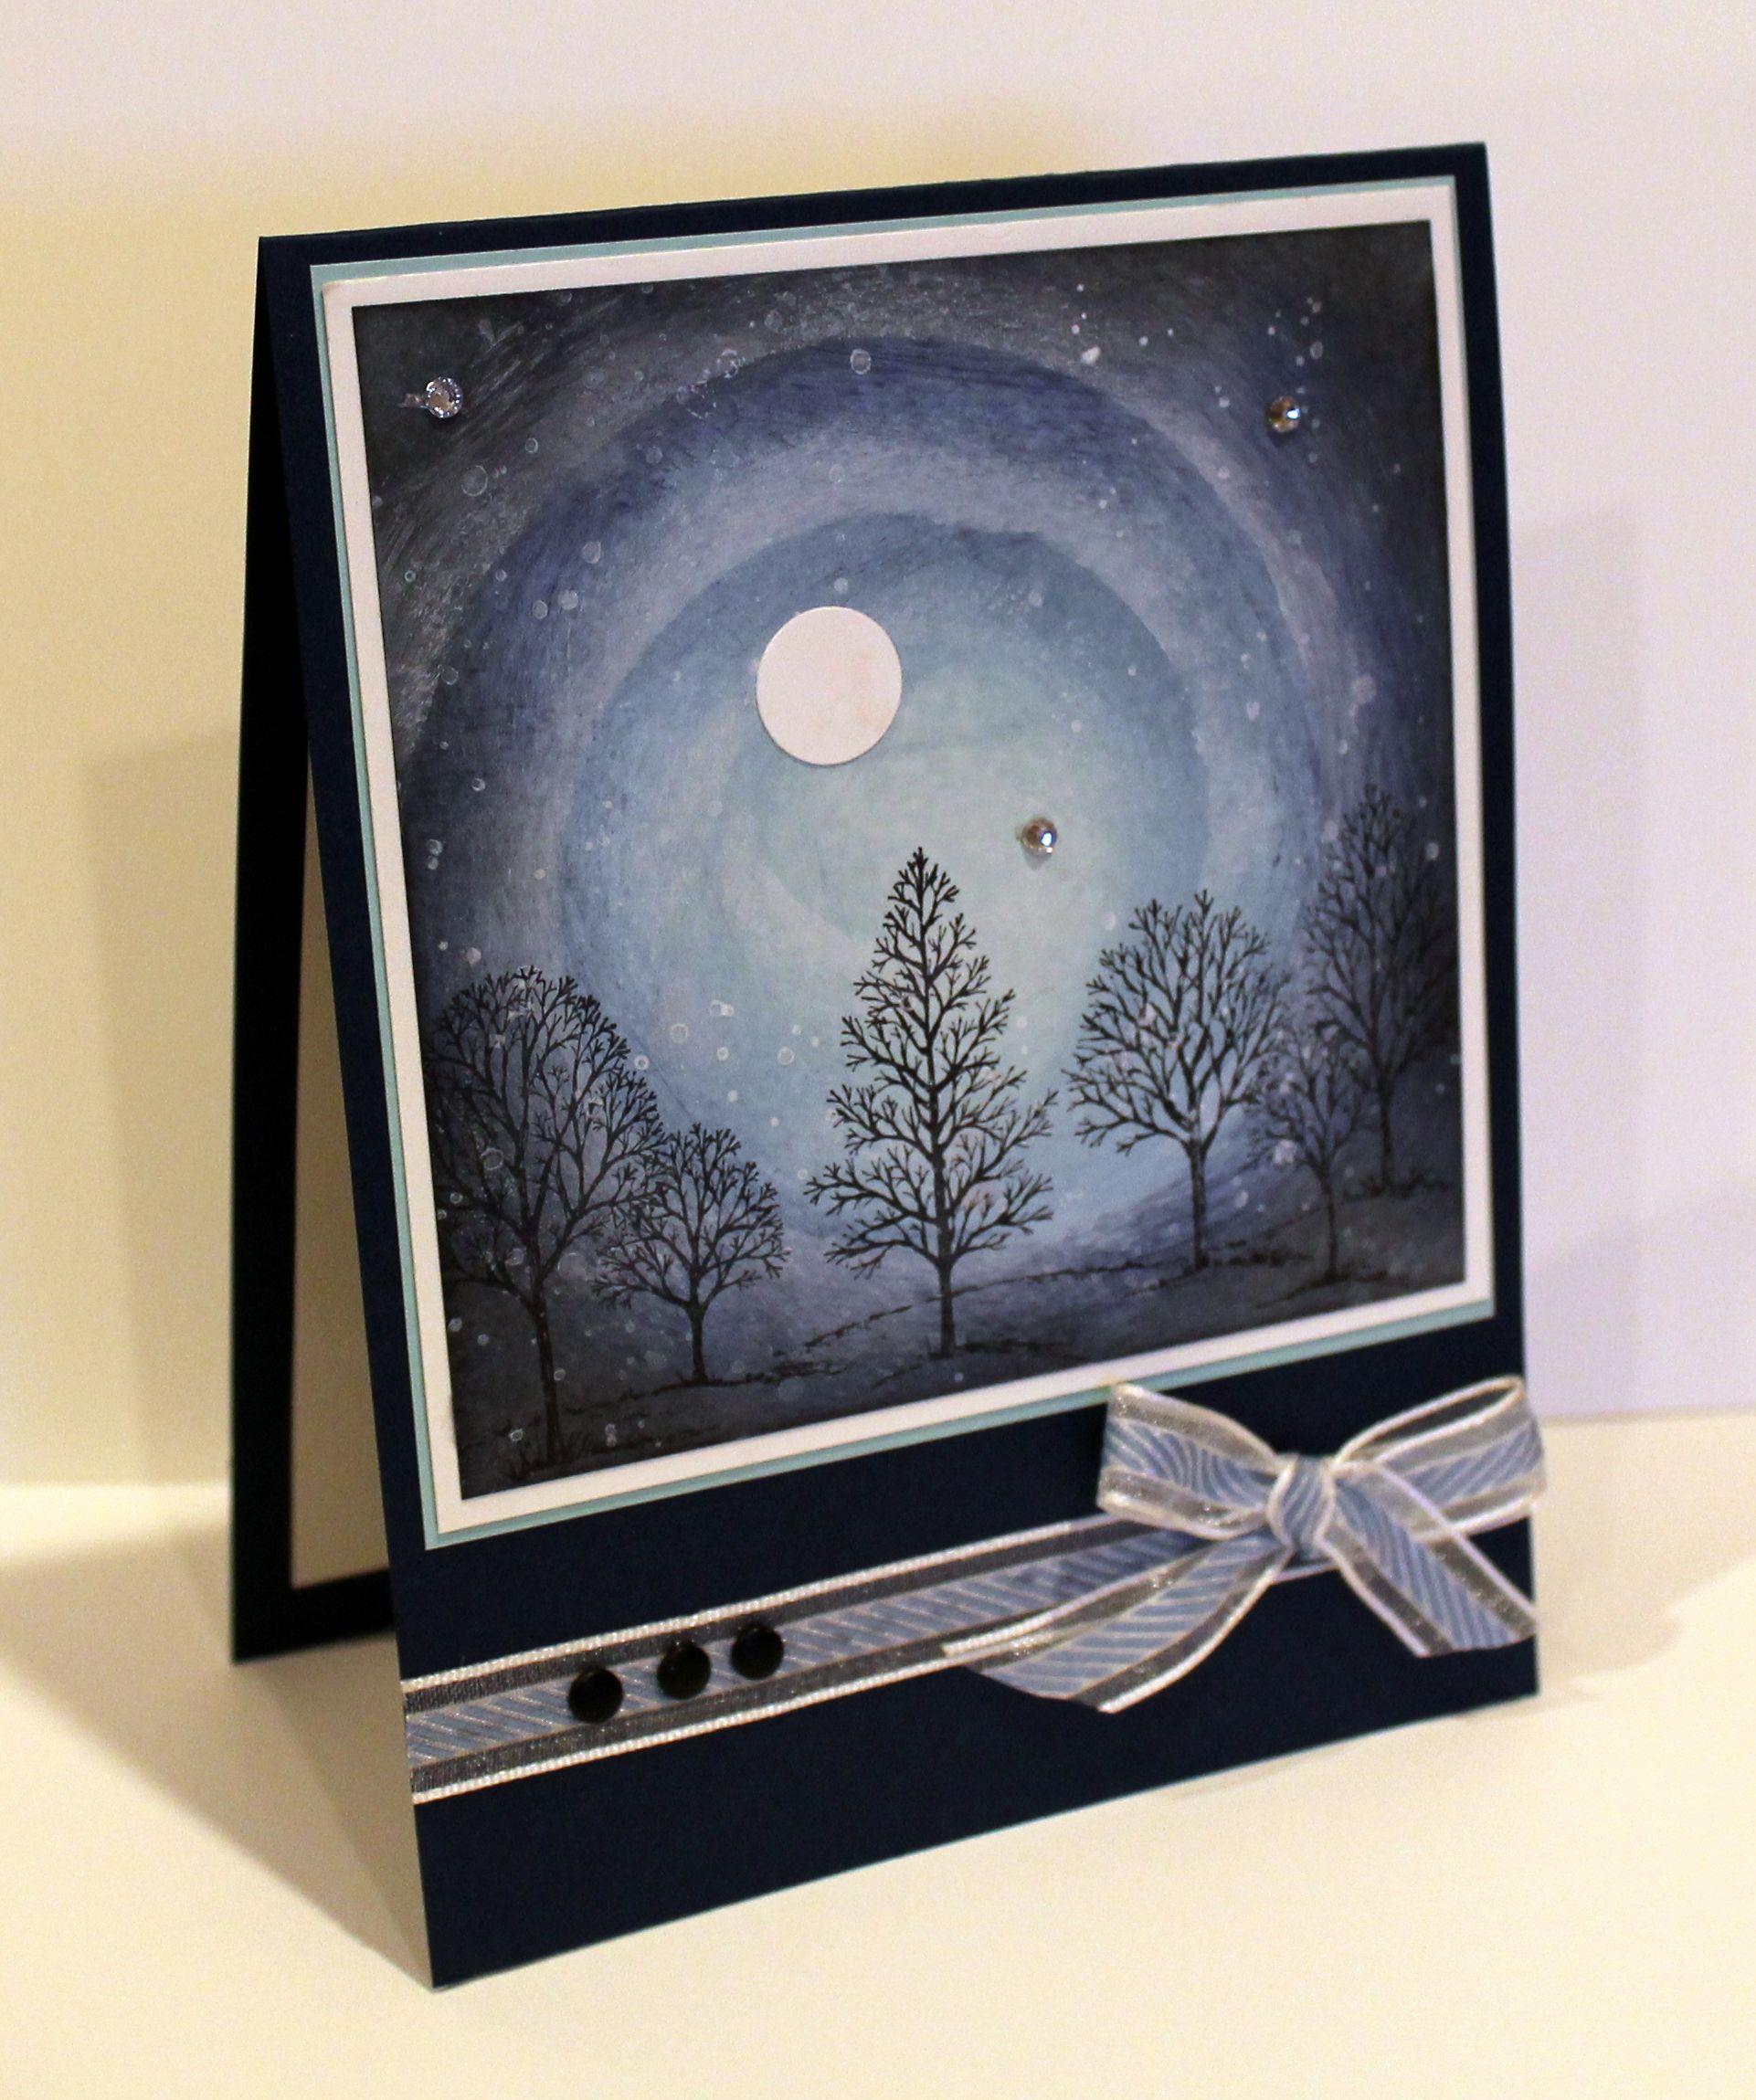 JLM Version Of Michelle Zindorf's Starry Night